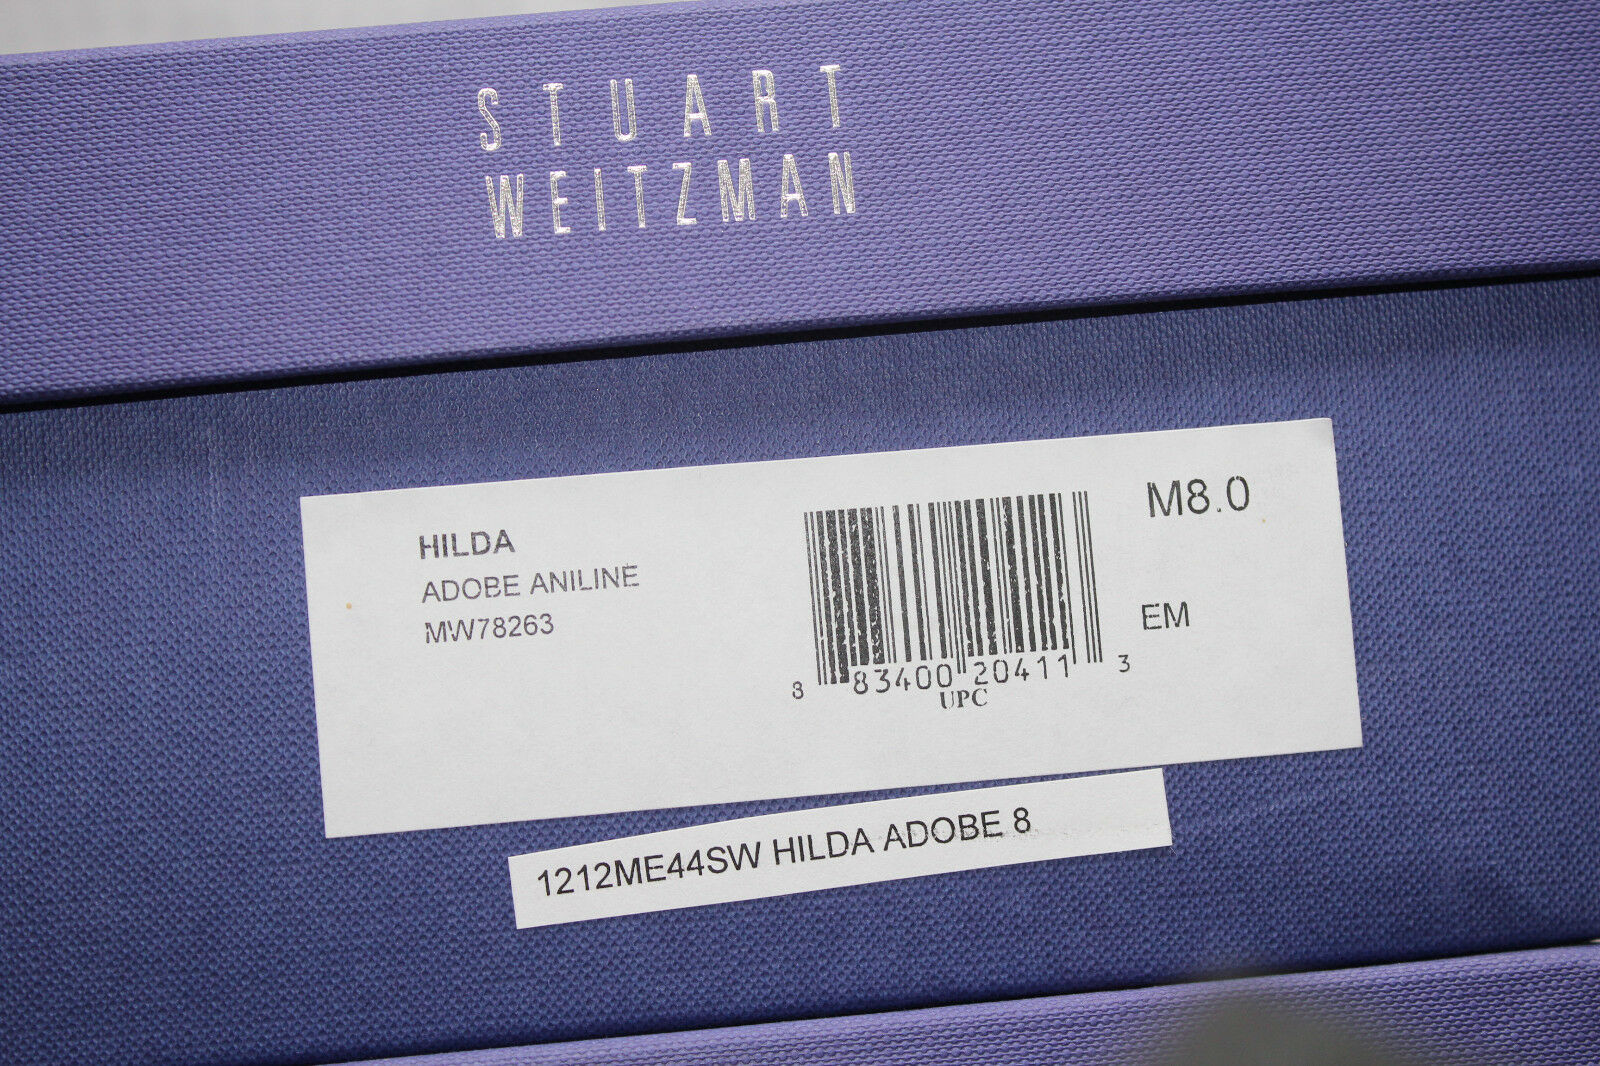 STUART WEITZMAN HILDA ADOBE ADOBE ADOBE ANILLENE  8us  388 3b29de